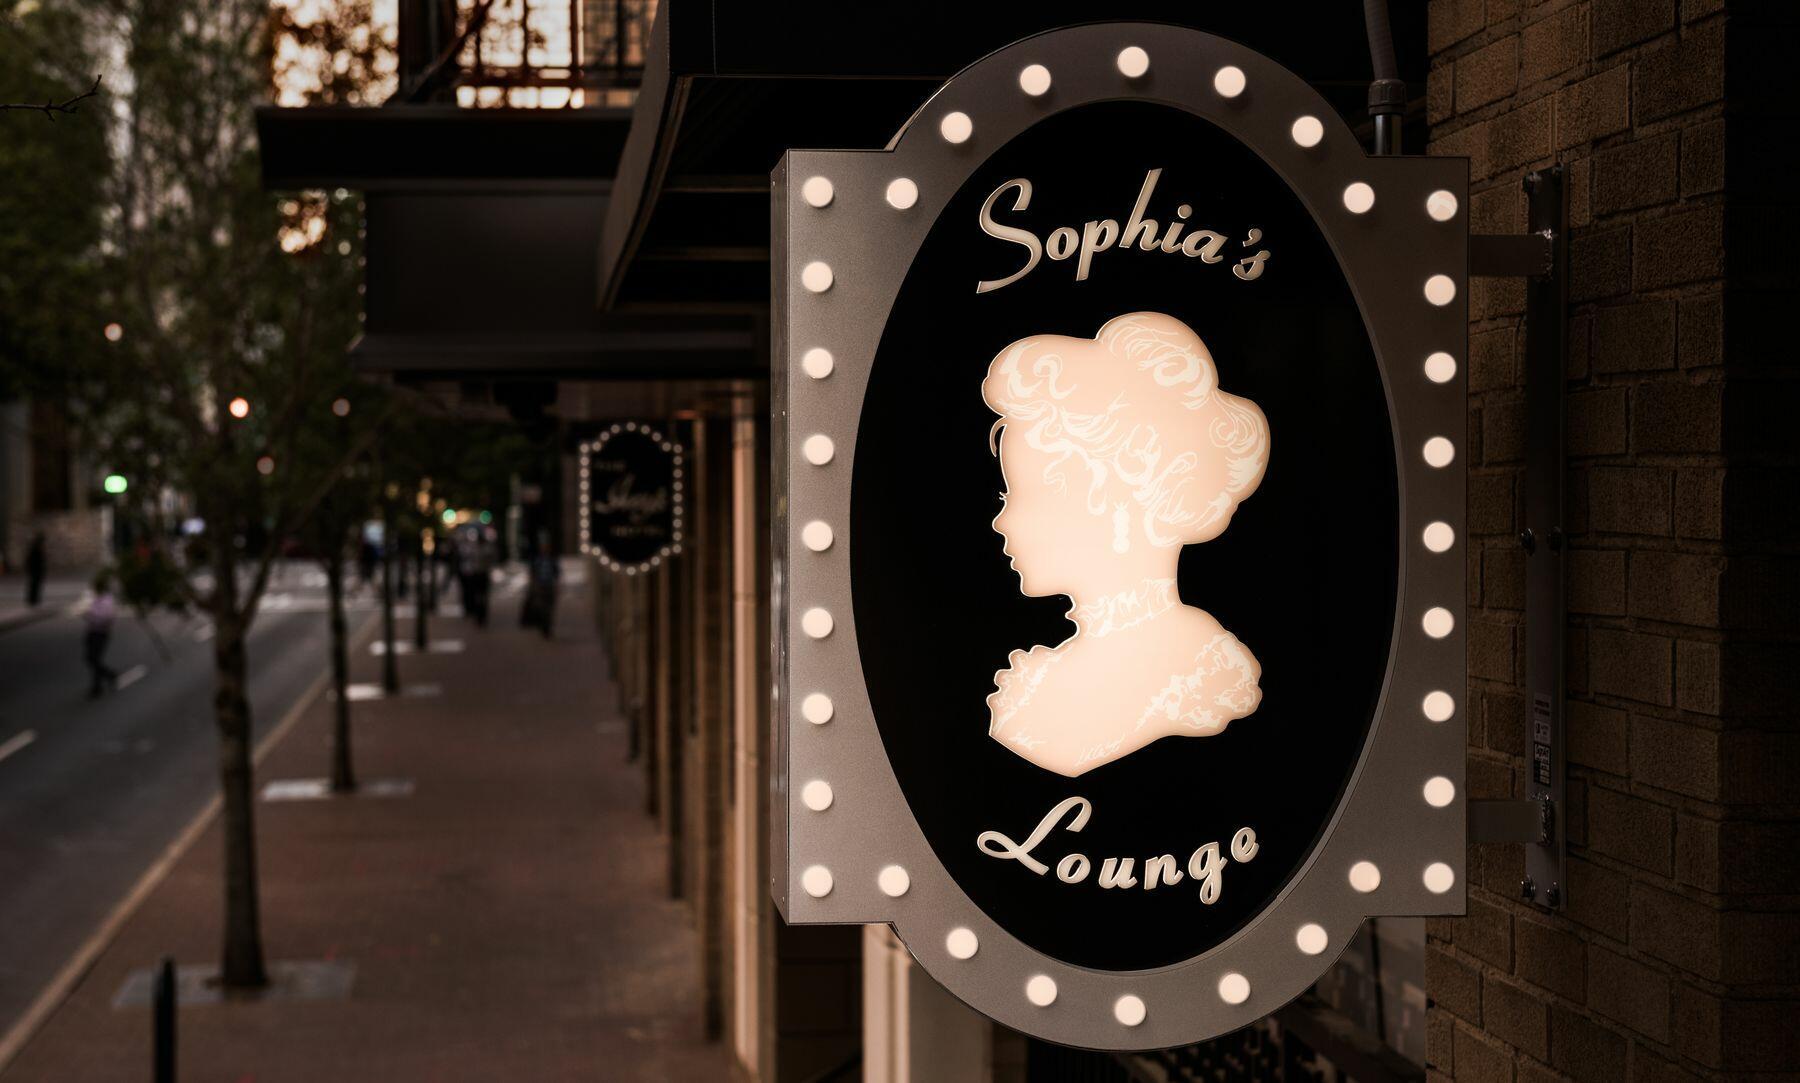 outside sign for sophias lounge